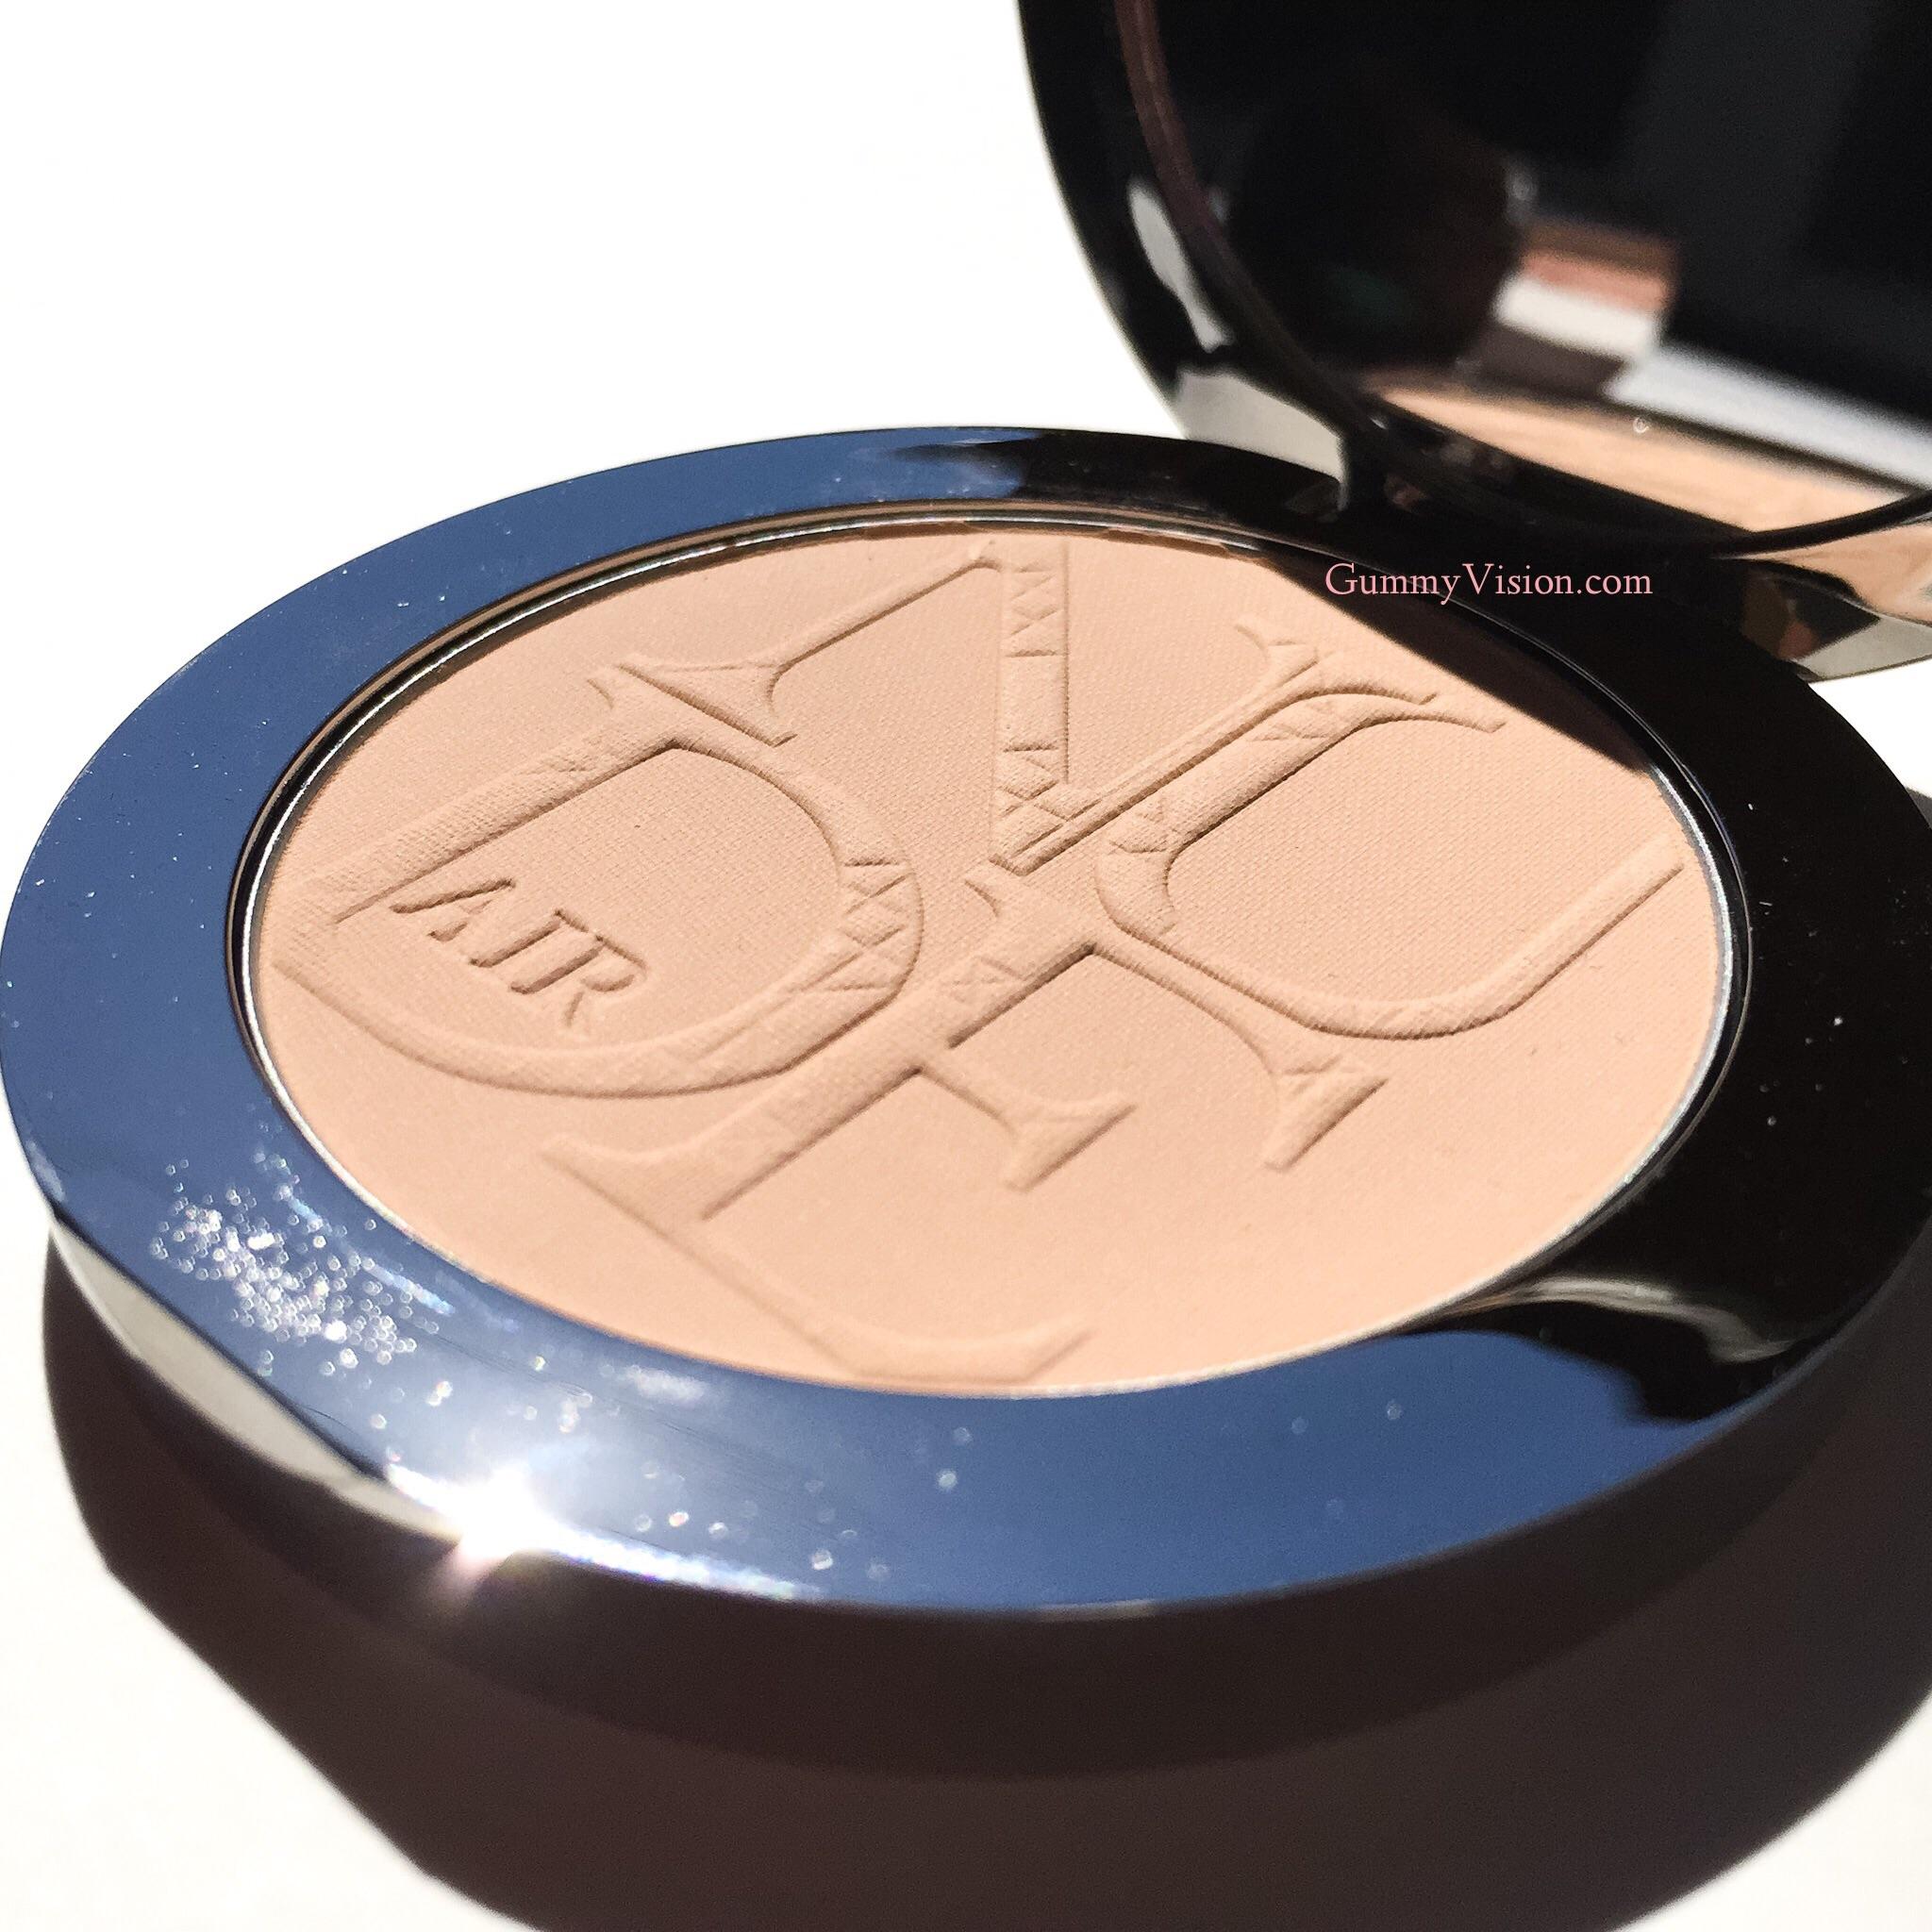 Dior Diorskin Nude Air Healthy Glow Invisible Powder In 020 Light Beige - gummyvision.com